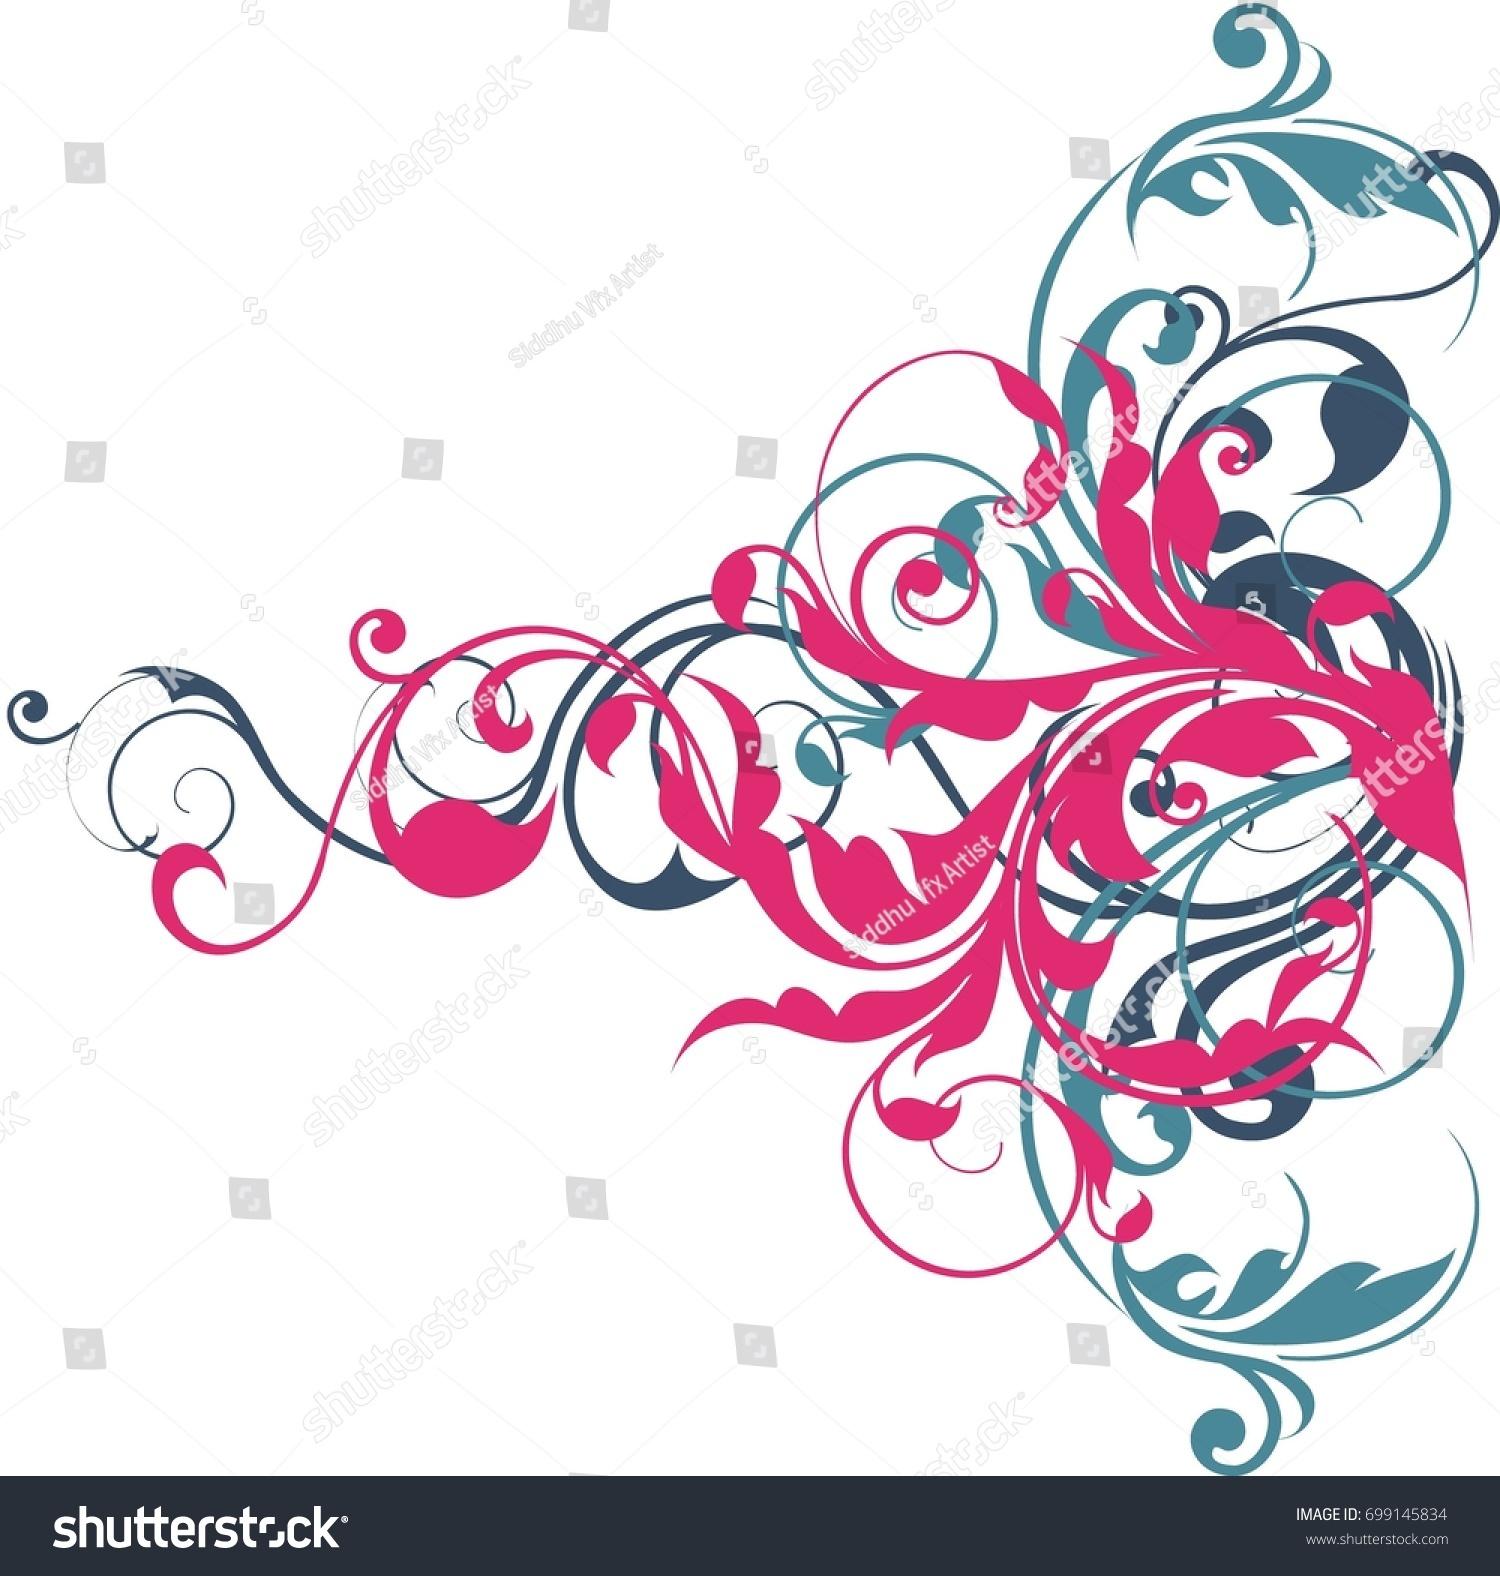 Creative Digital Floral Designs Stock Illustration